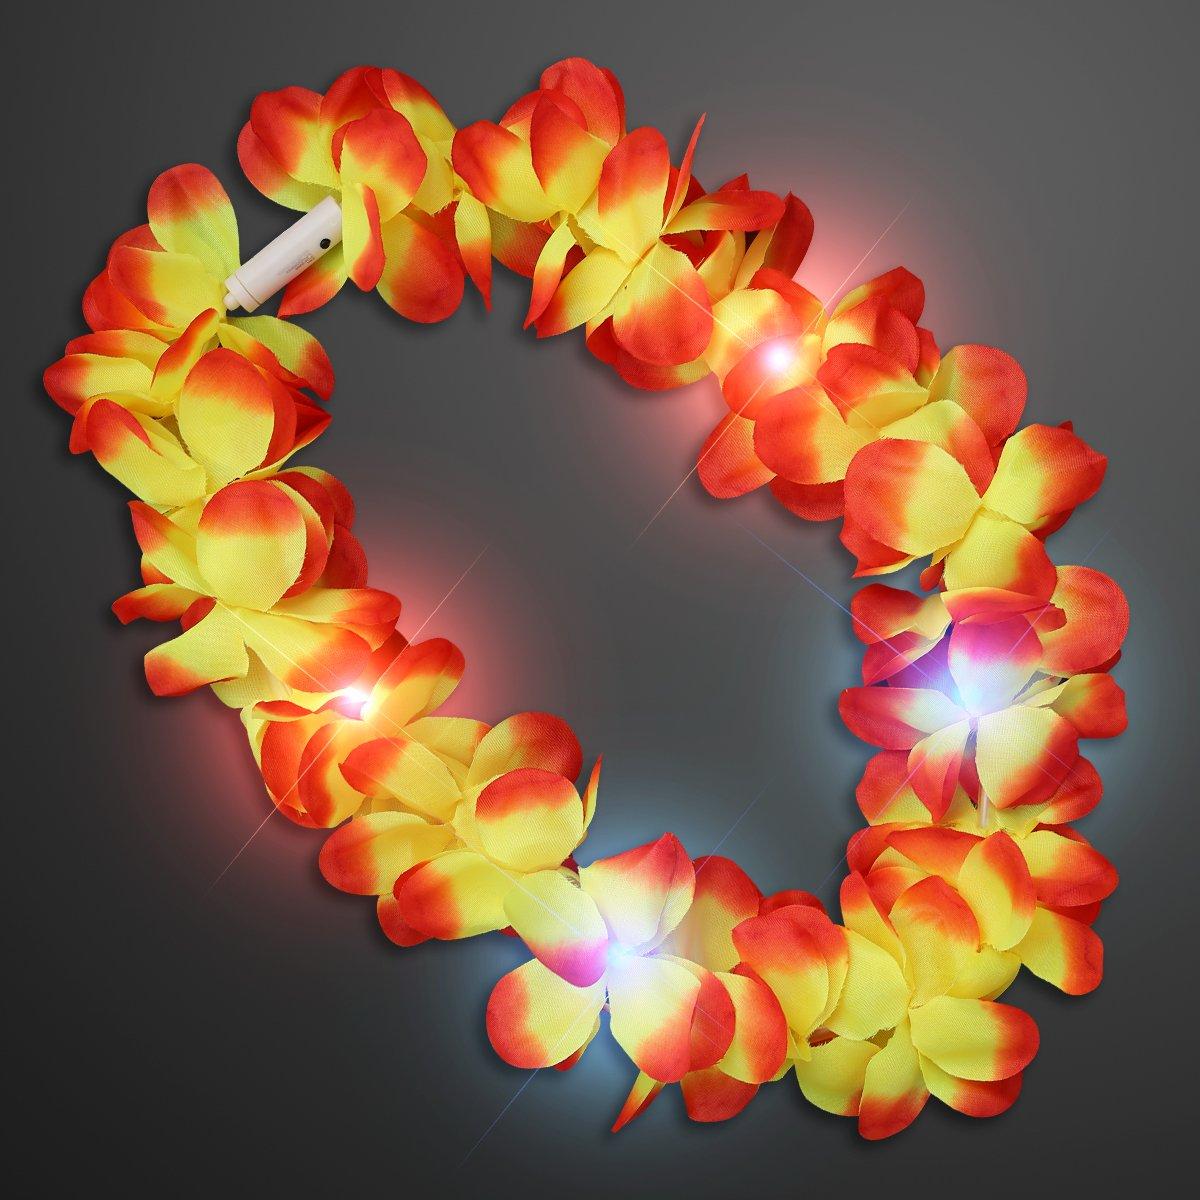 Large Assorted Light Up Hawaiian Leis with Flashing LED Lights (Set of 24) by FlashingBlinkyLights (Image #3)